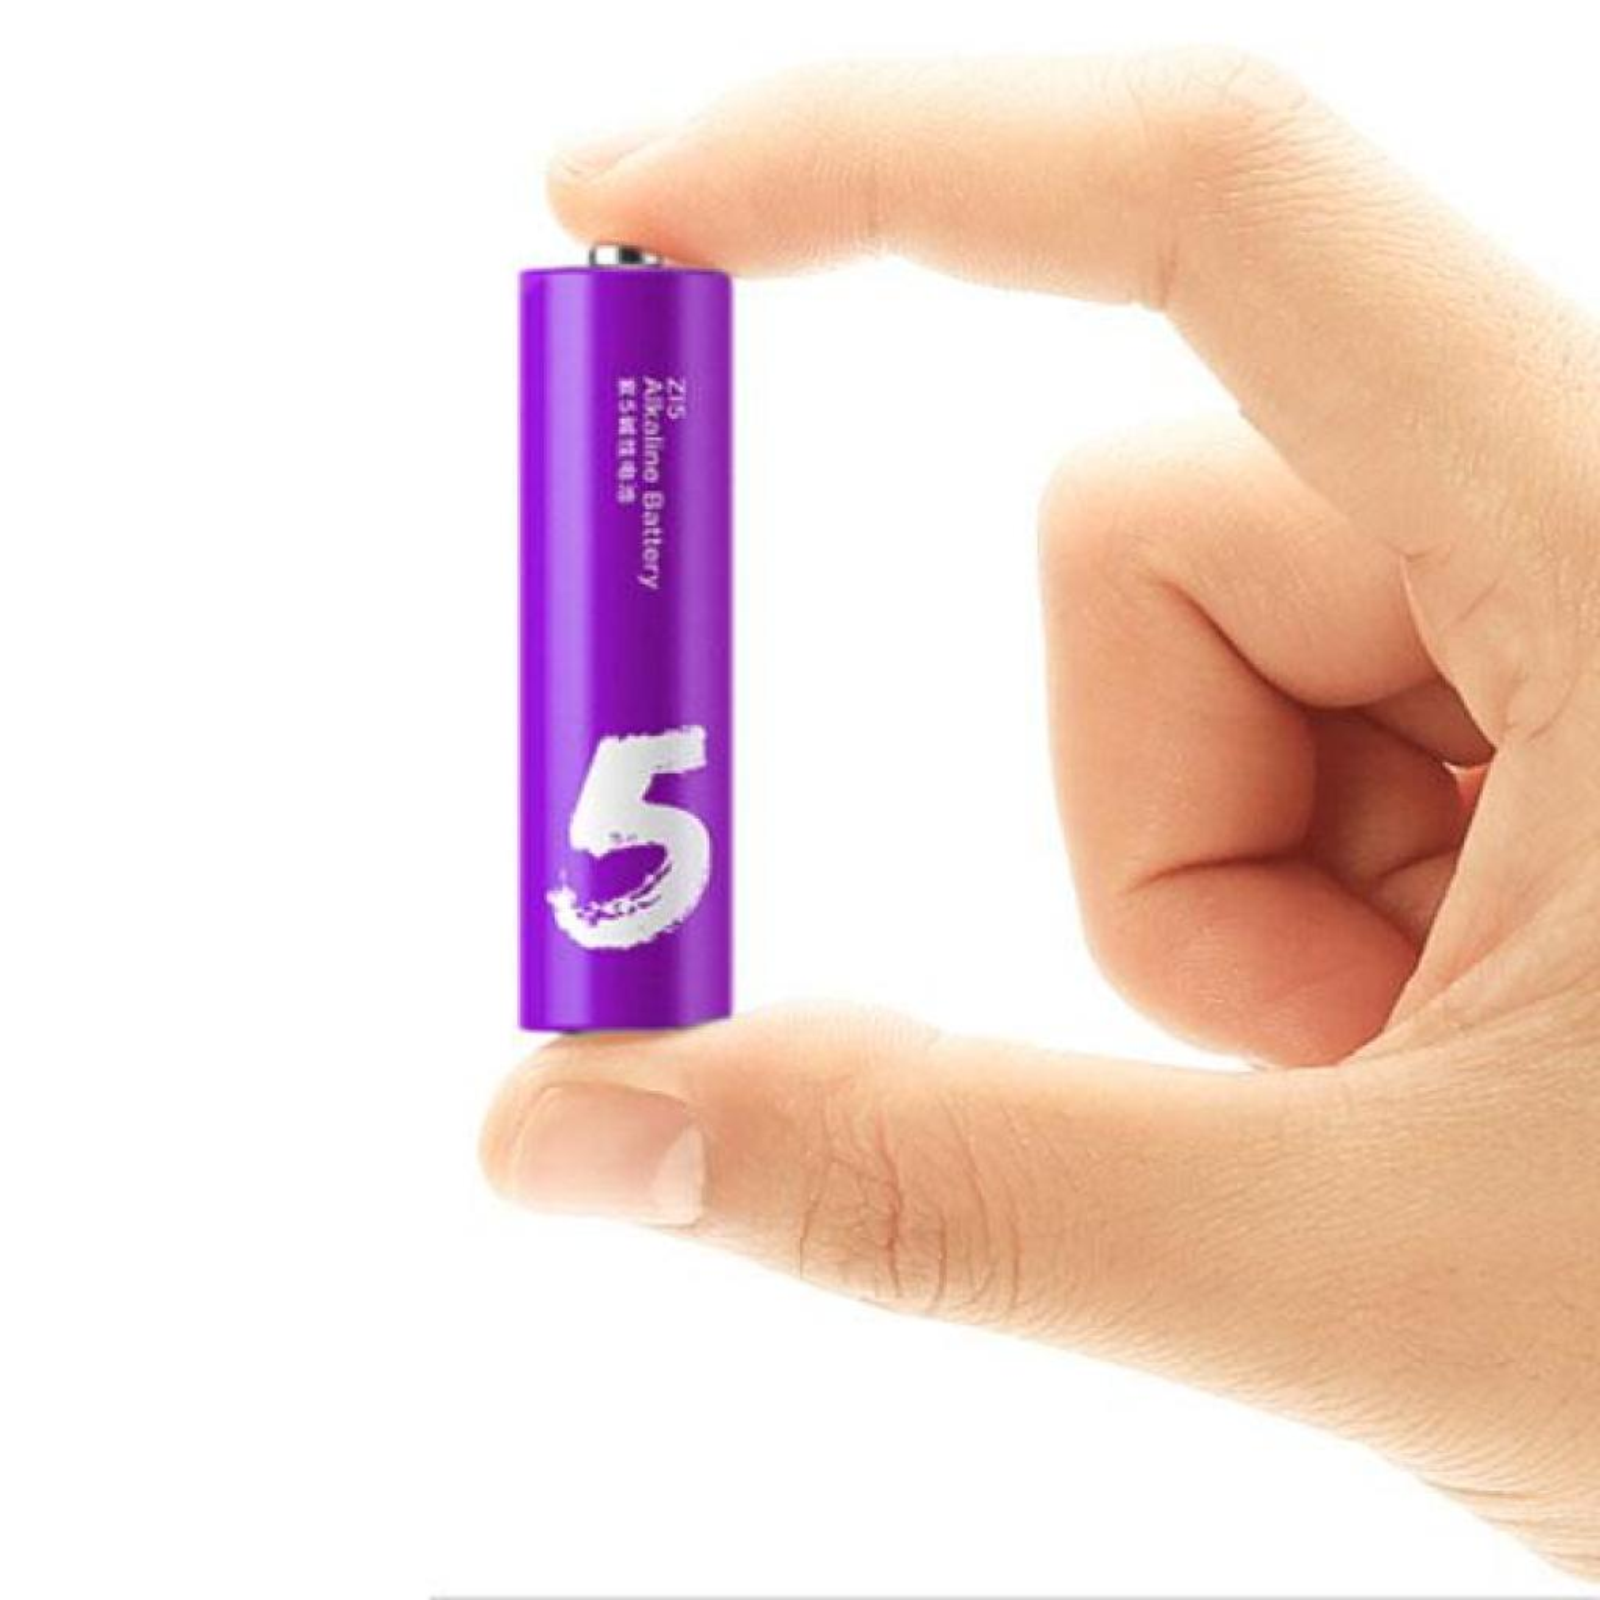 Батарейка ZMI ZI5 Rainbow AA batteries * 40 (Ф01152) изображение 3